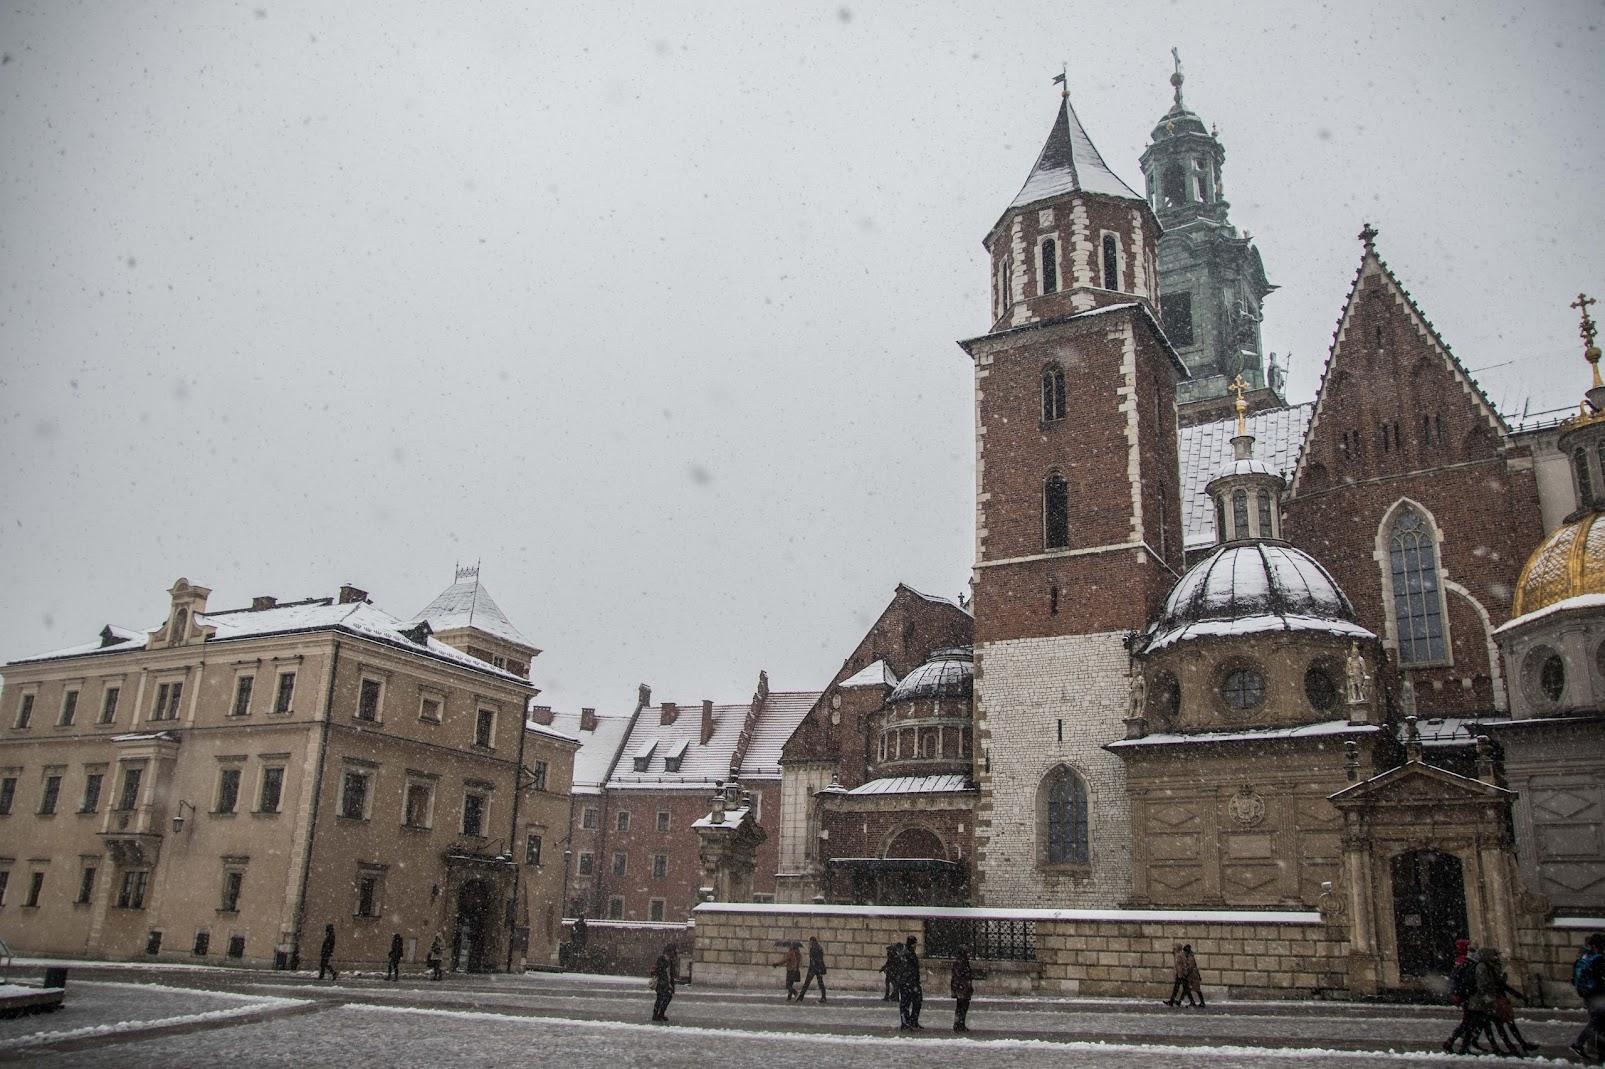 wilanov square cathedral in winter